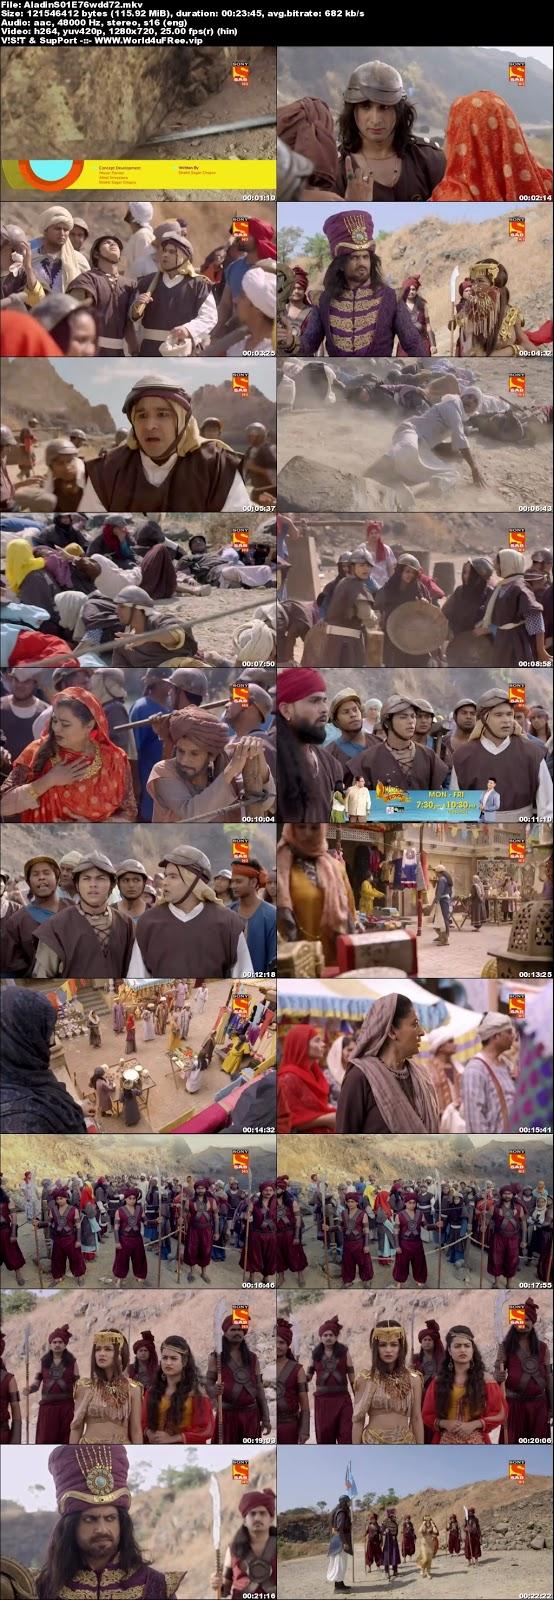 Aladdin 2018 Hindi Season 01 Episode 76 720p WEBRip 150Mb x264 world4ufree.fun tv show Aladdin 2018 hindi tv show Aladdin 2018 Season 11 Sony tv show compressed small size free download or watch online at world4ufree.fun